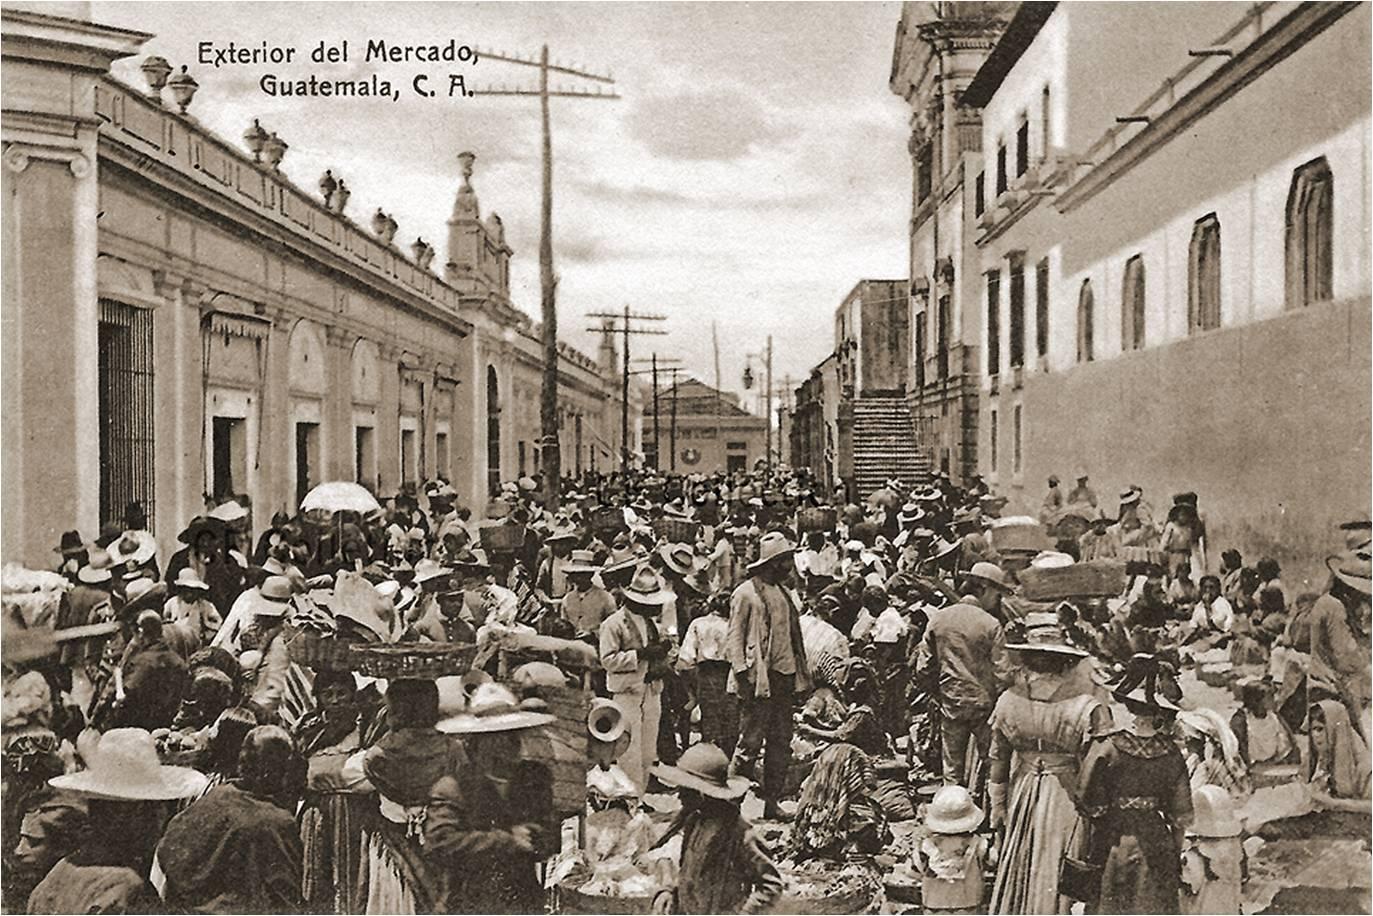 Centro Hist Rico En Guatemala 2011 # Muebles En Kaqchikel